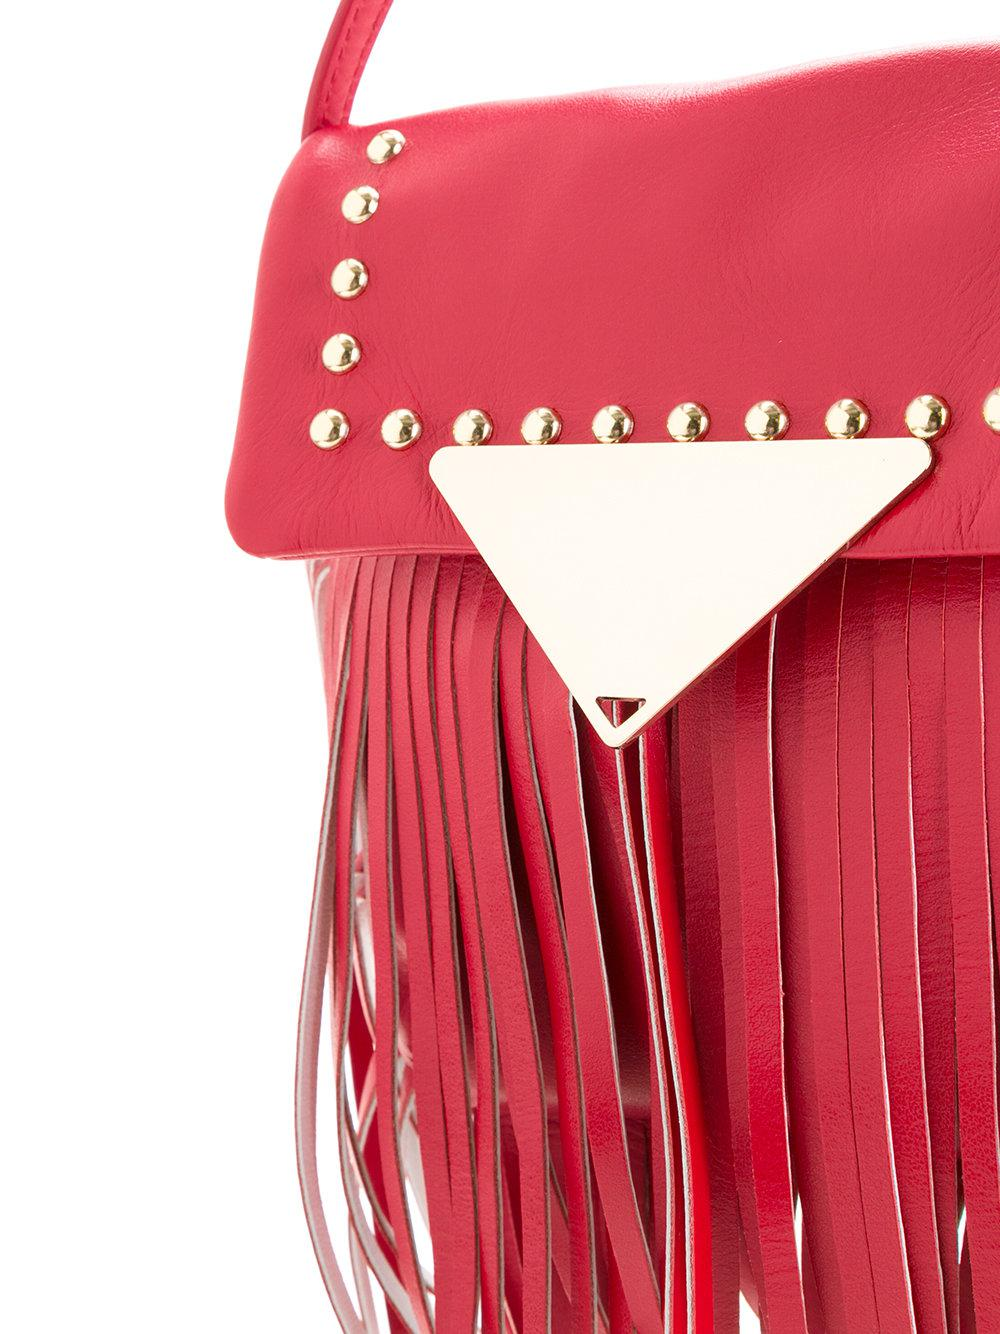 Sara Battaglia Leather Fringed Studded Crossbody Bag in Red